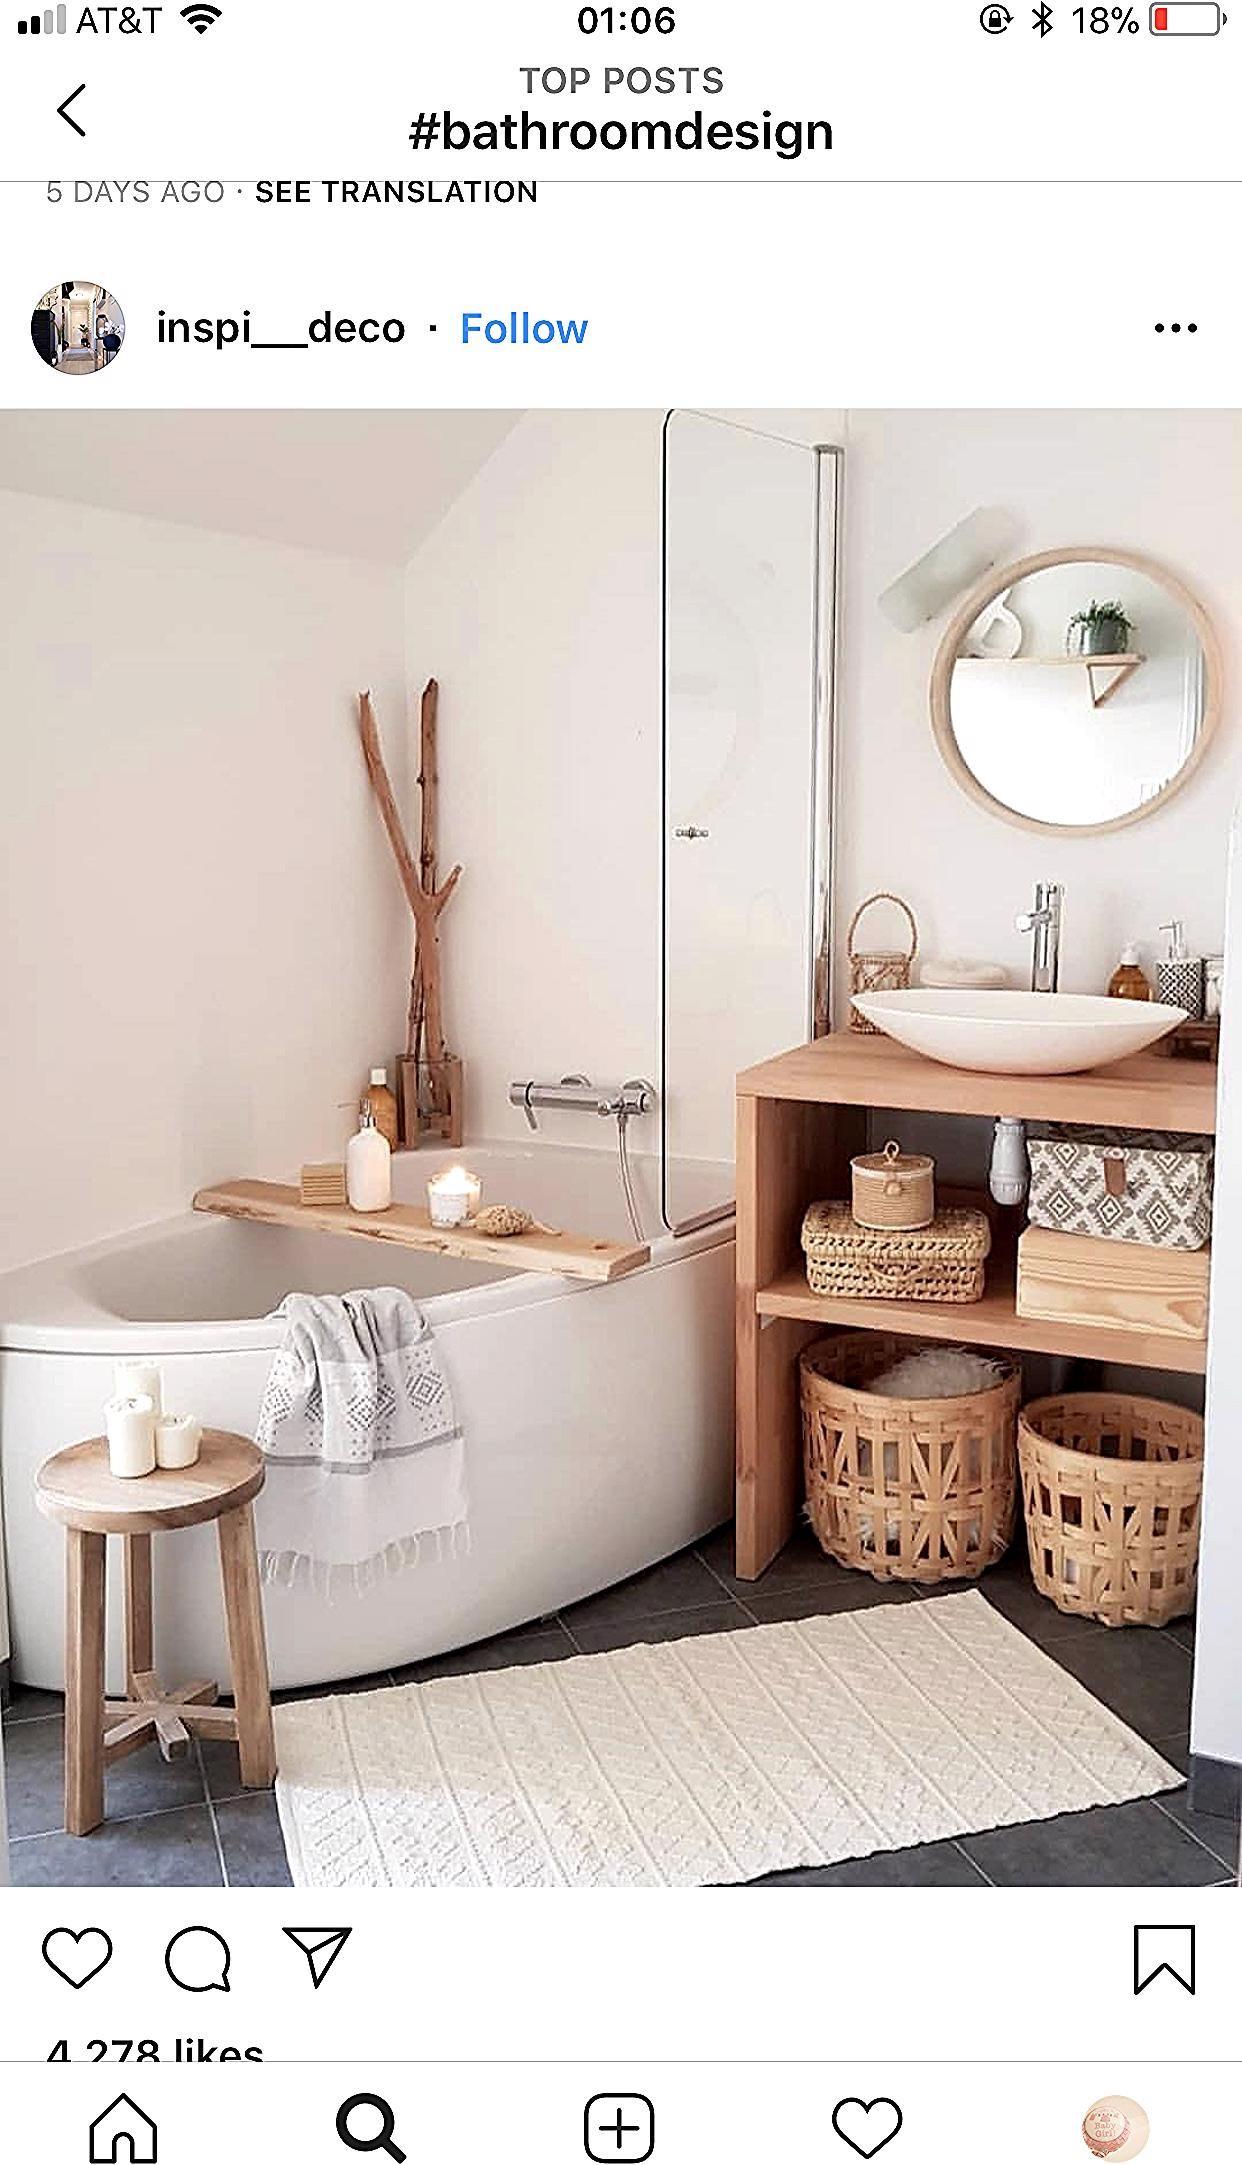 Tabouret De Salle De Bain By Susie Hermiston In 2020 Apartment Bathroom Design Bathroom Design Decor Amazing Bathrooms